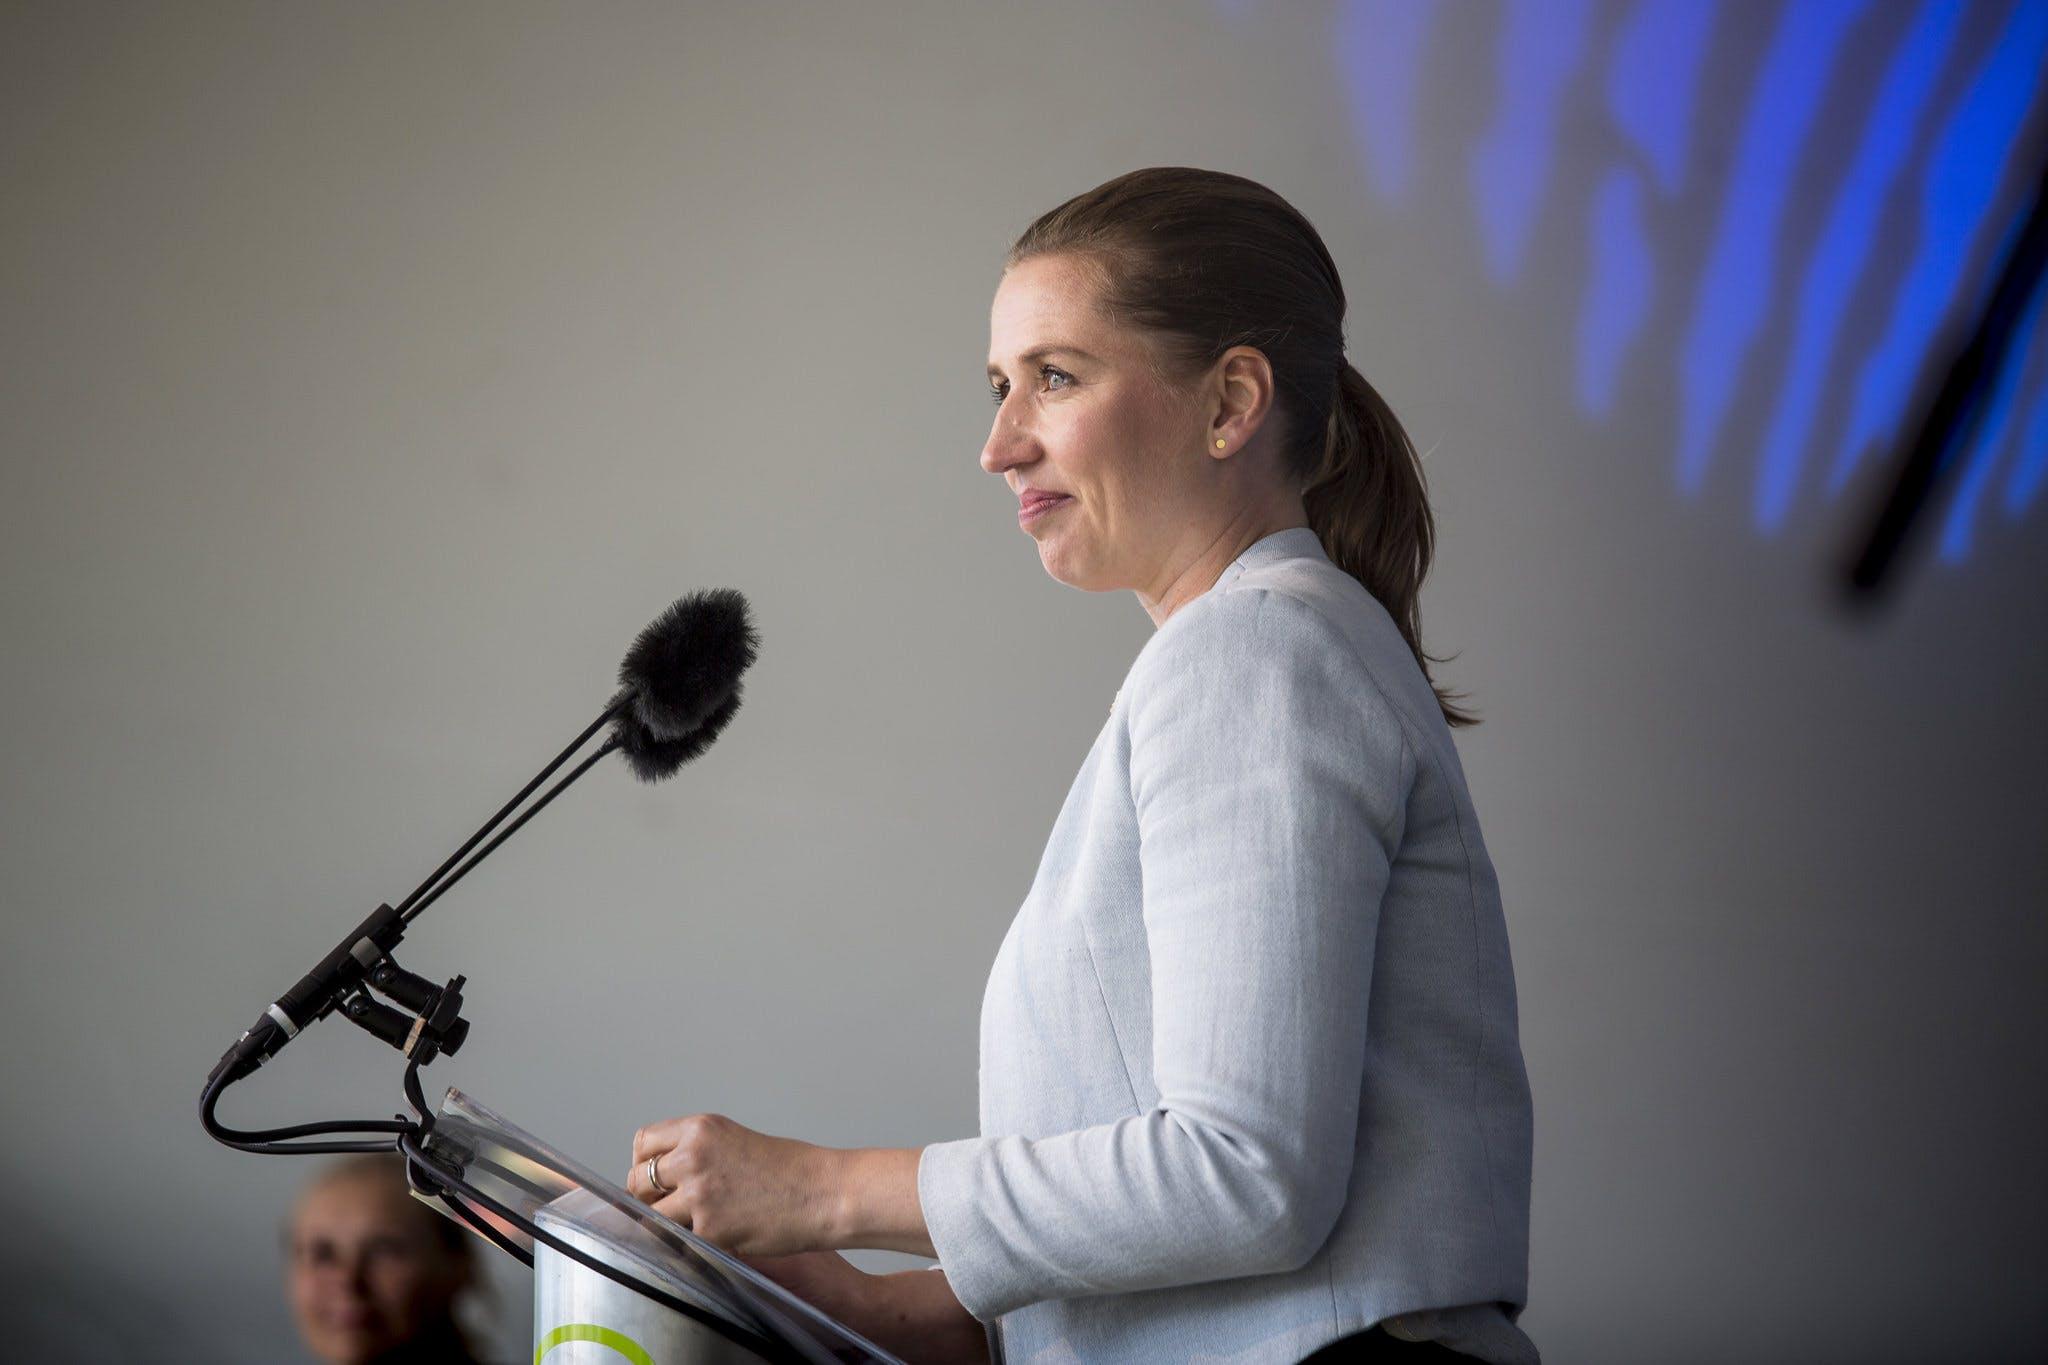 Foto: News Øresund - Sofie Paisley